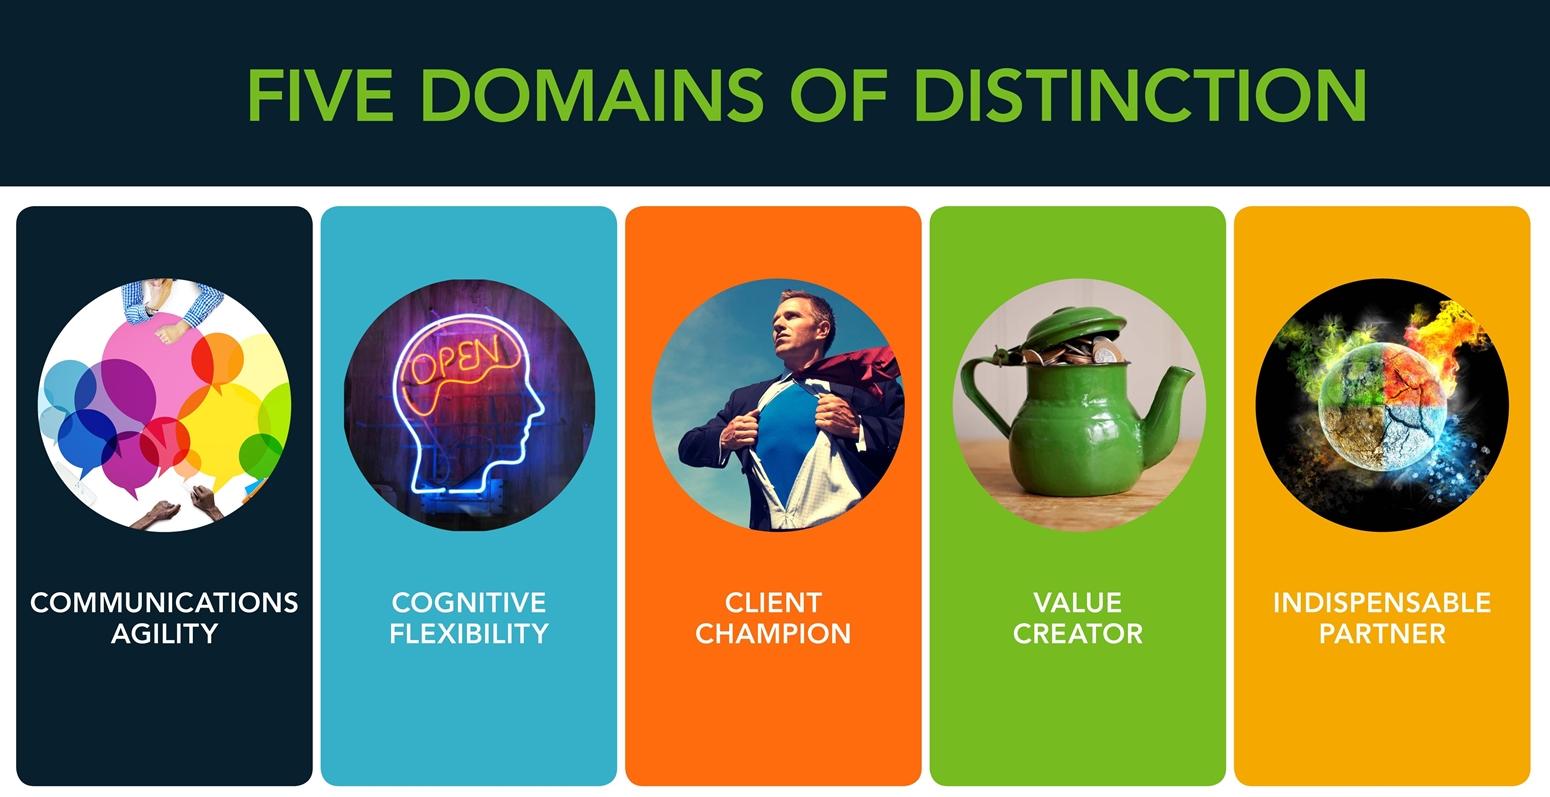 The five domains of distinction-communication agility, cognitive flexibility, client champion, value creator, and indispensable partner.